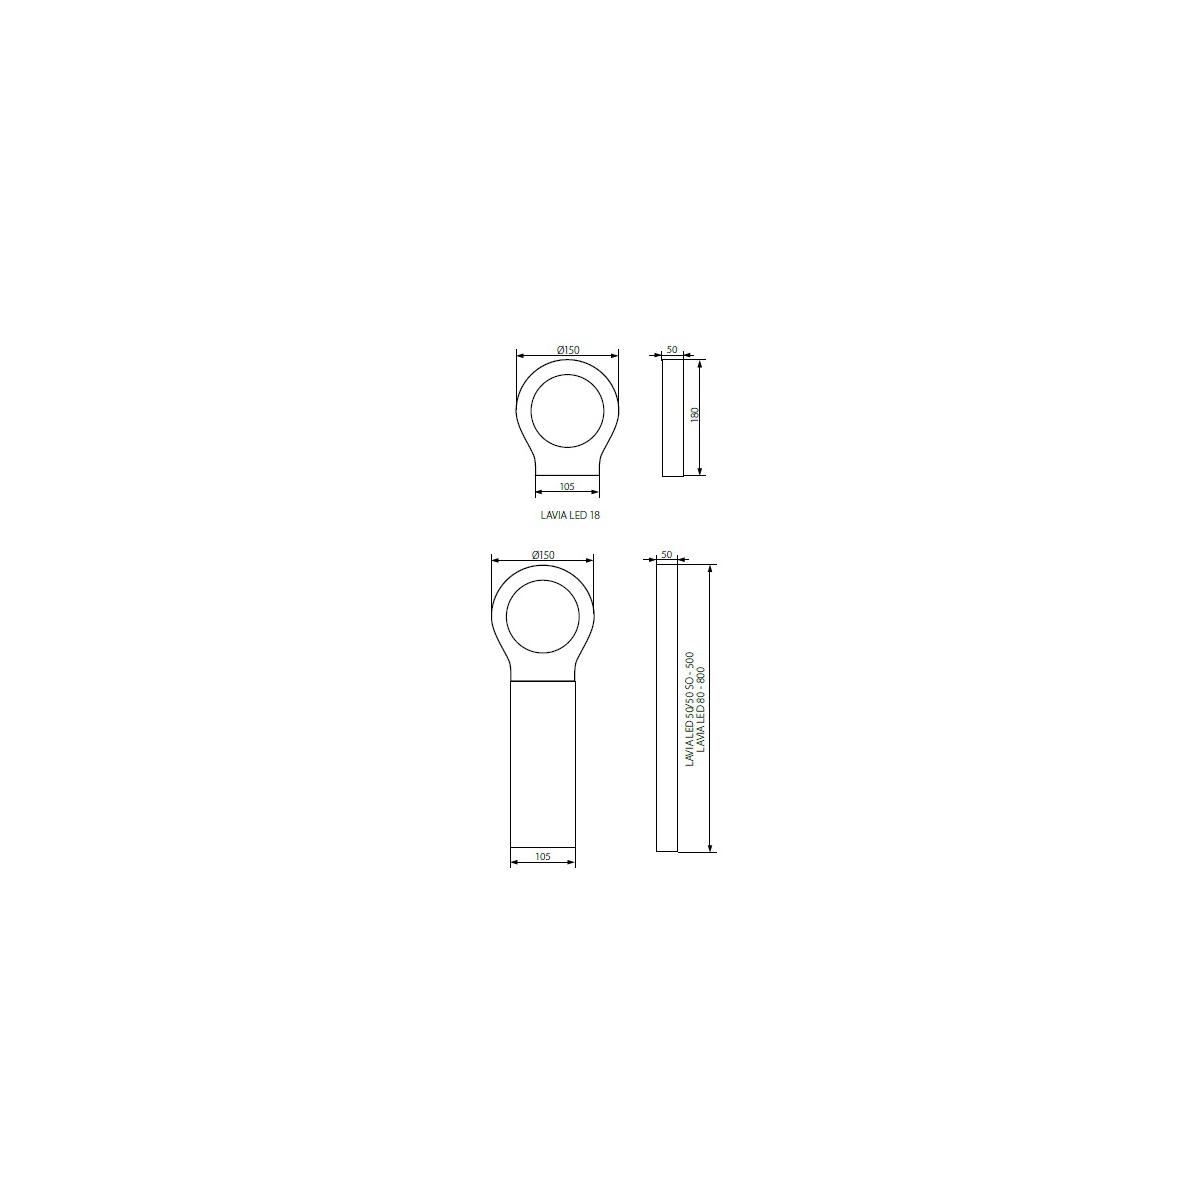 Oprawa ogrodowa LAVIA LED 50-SO (23563)